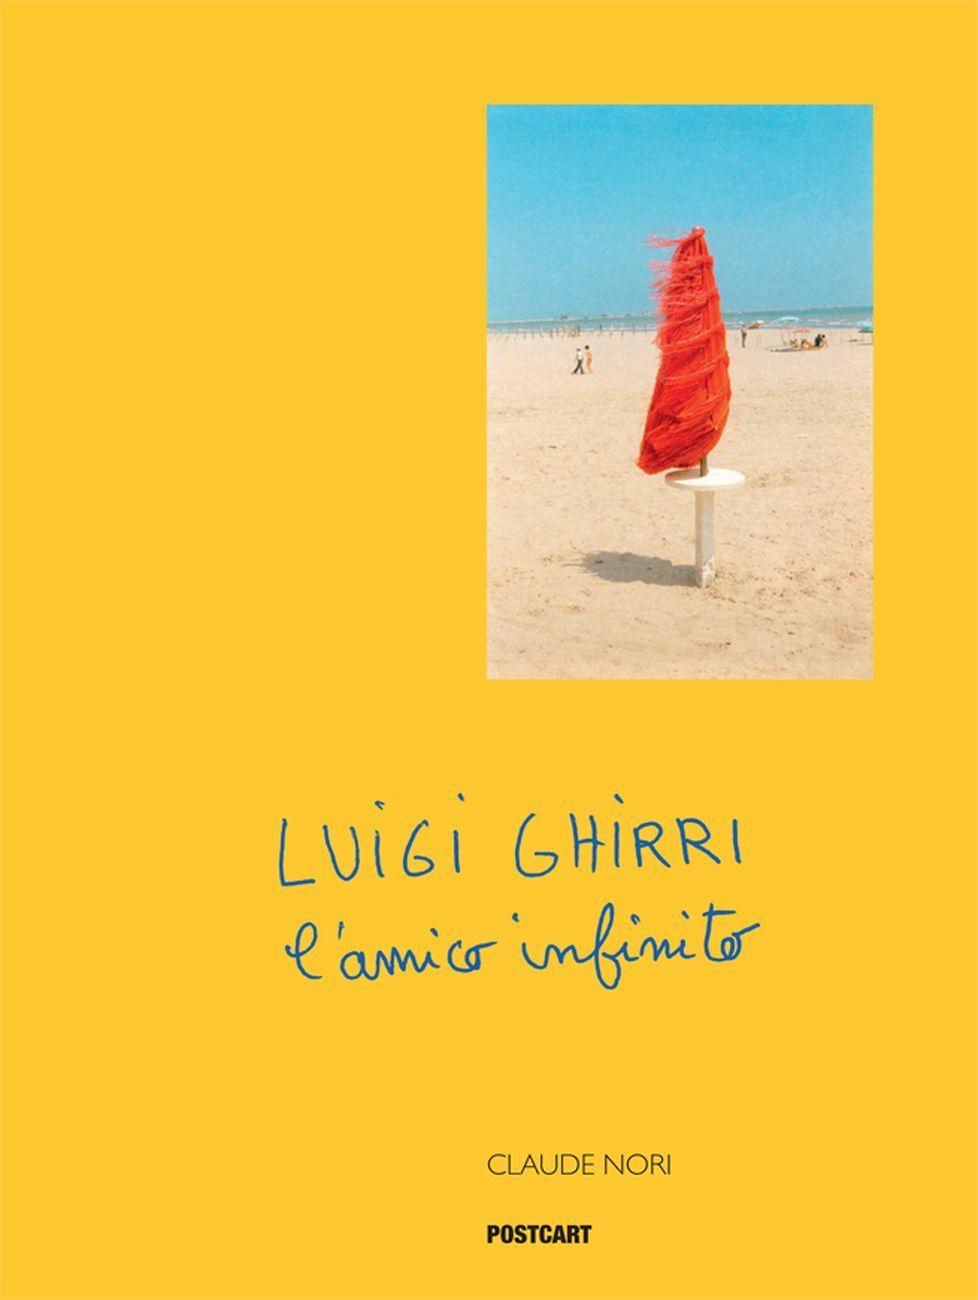 Claude Nori ‒ Luigi Ghirri. L'amico infinito (Postcart, Roma 2019)